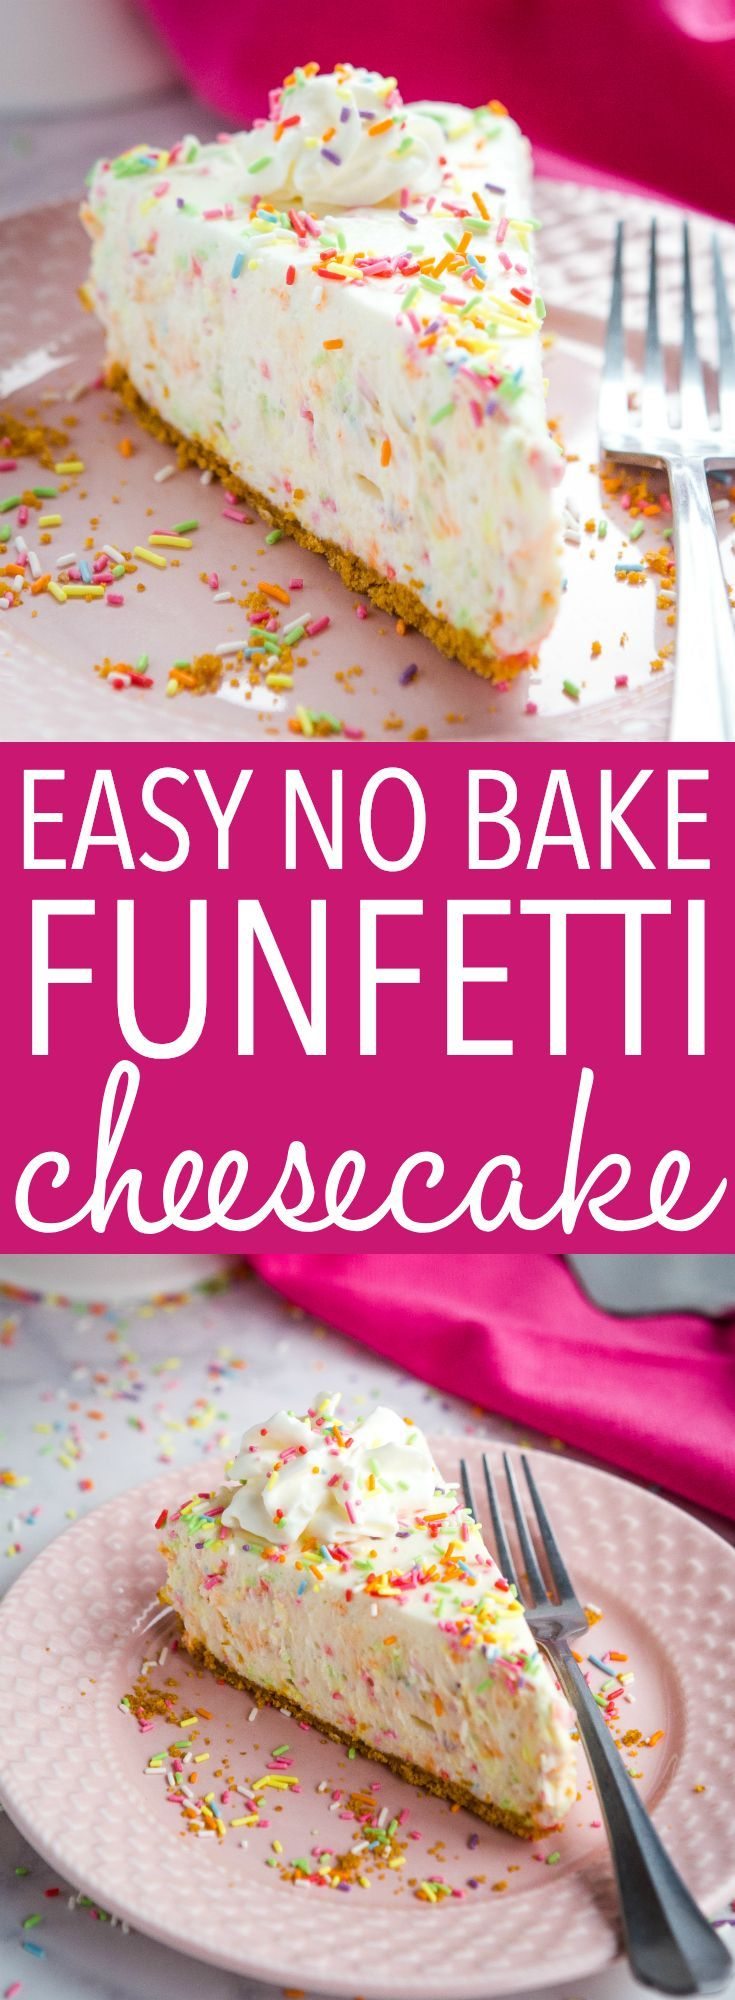 Easy No Bake Funfetti Cheesecake